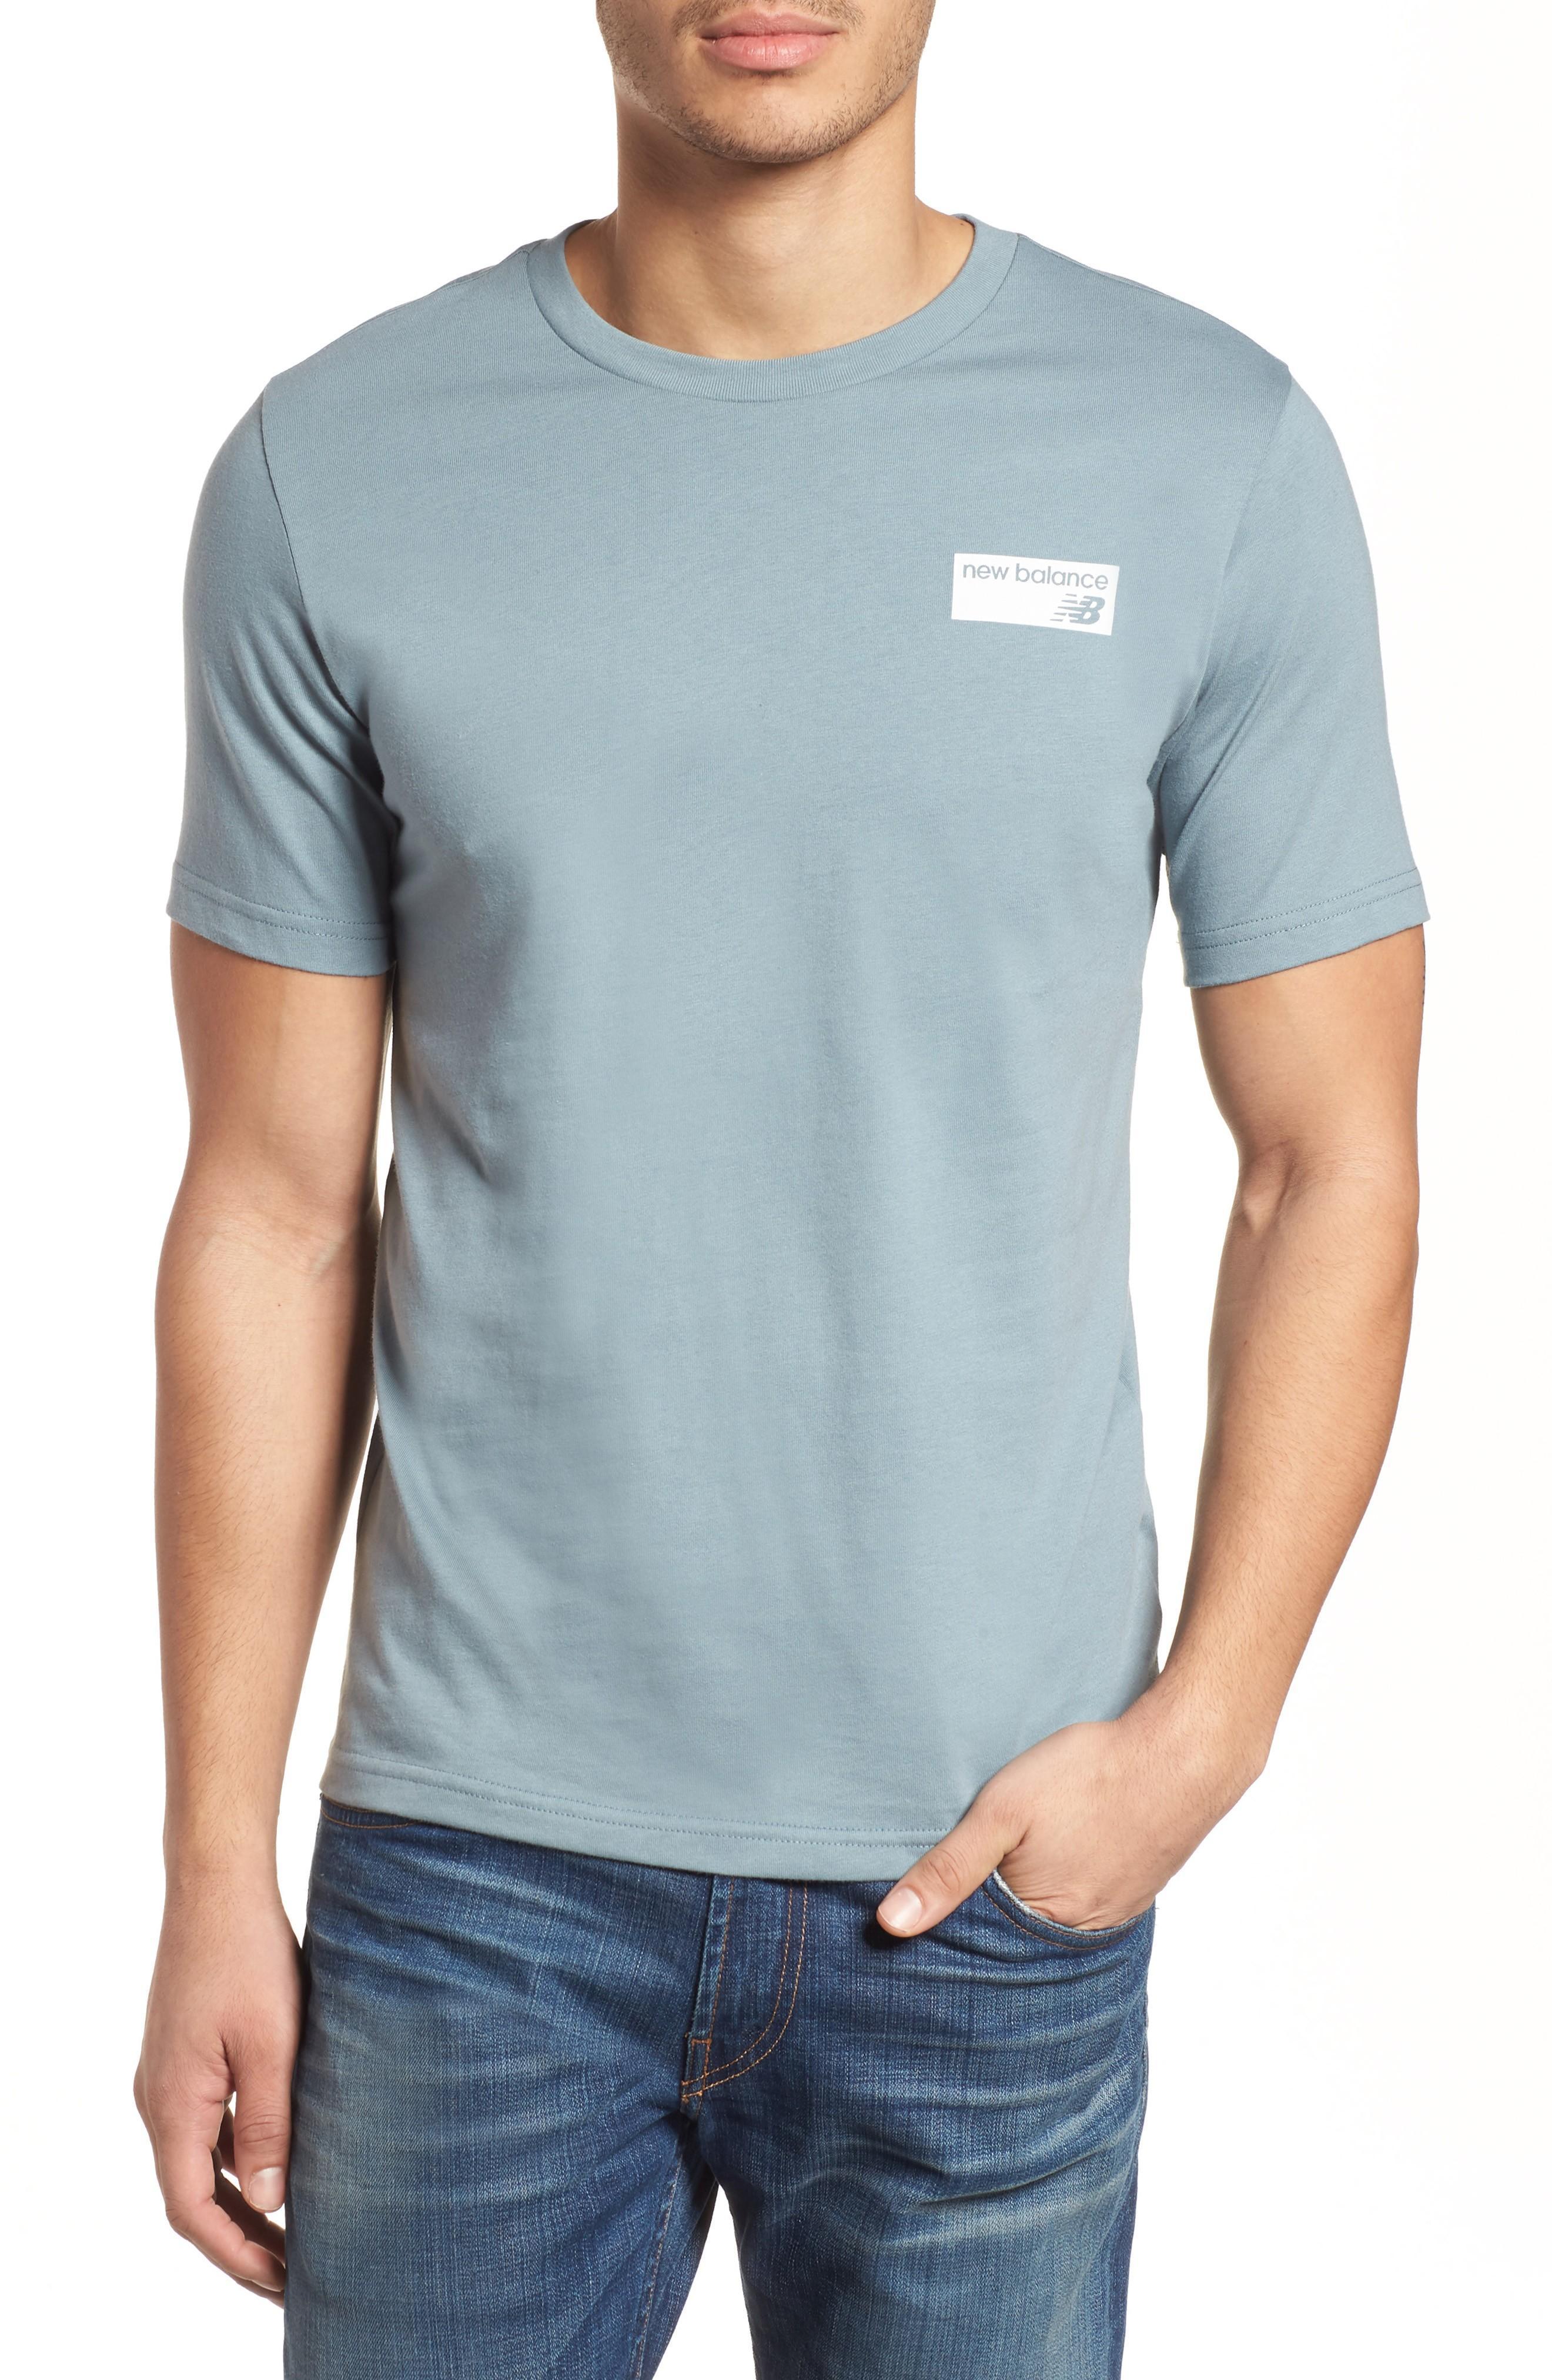 New Balance Athletics Classic Crewneck T-shirt In Slate